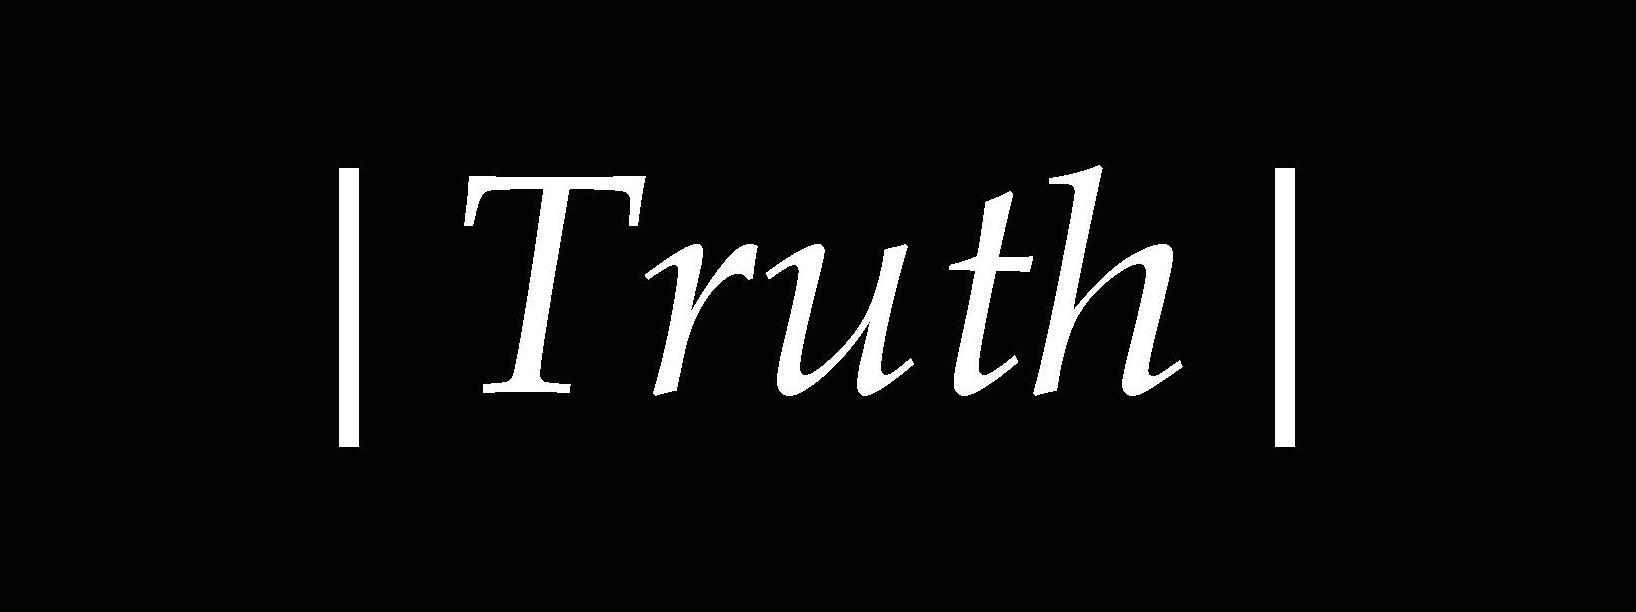 Hearing TRUTH by Doran Richards